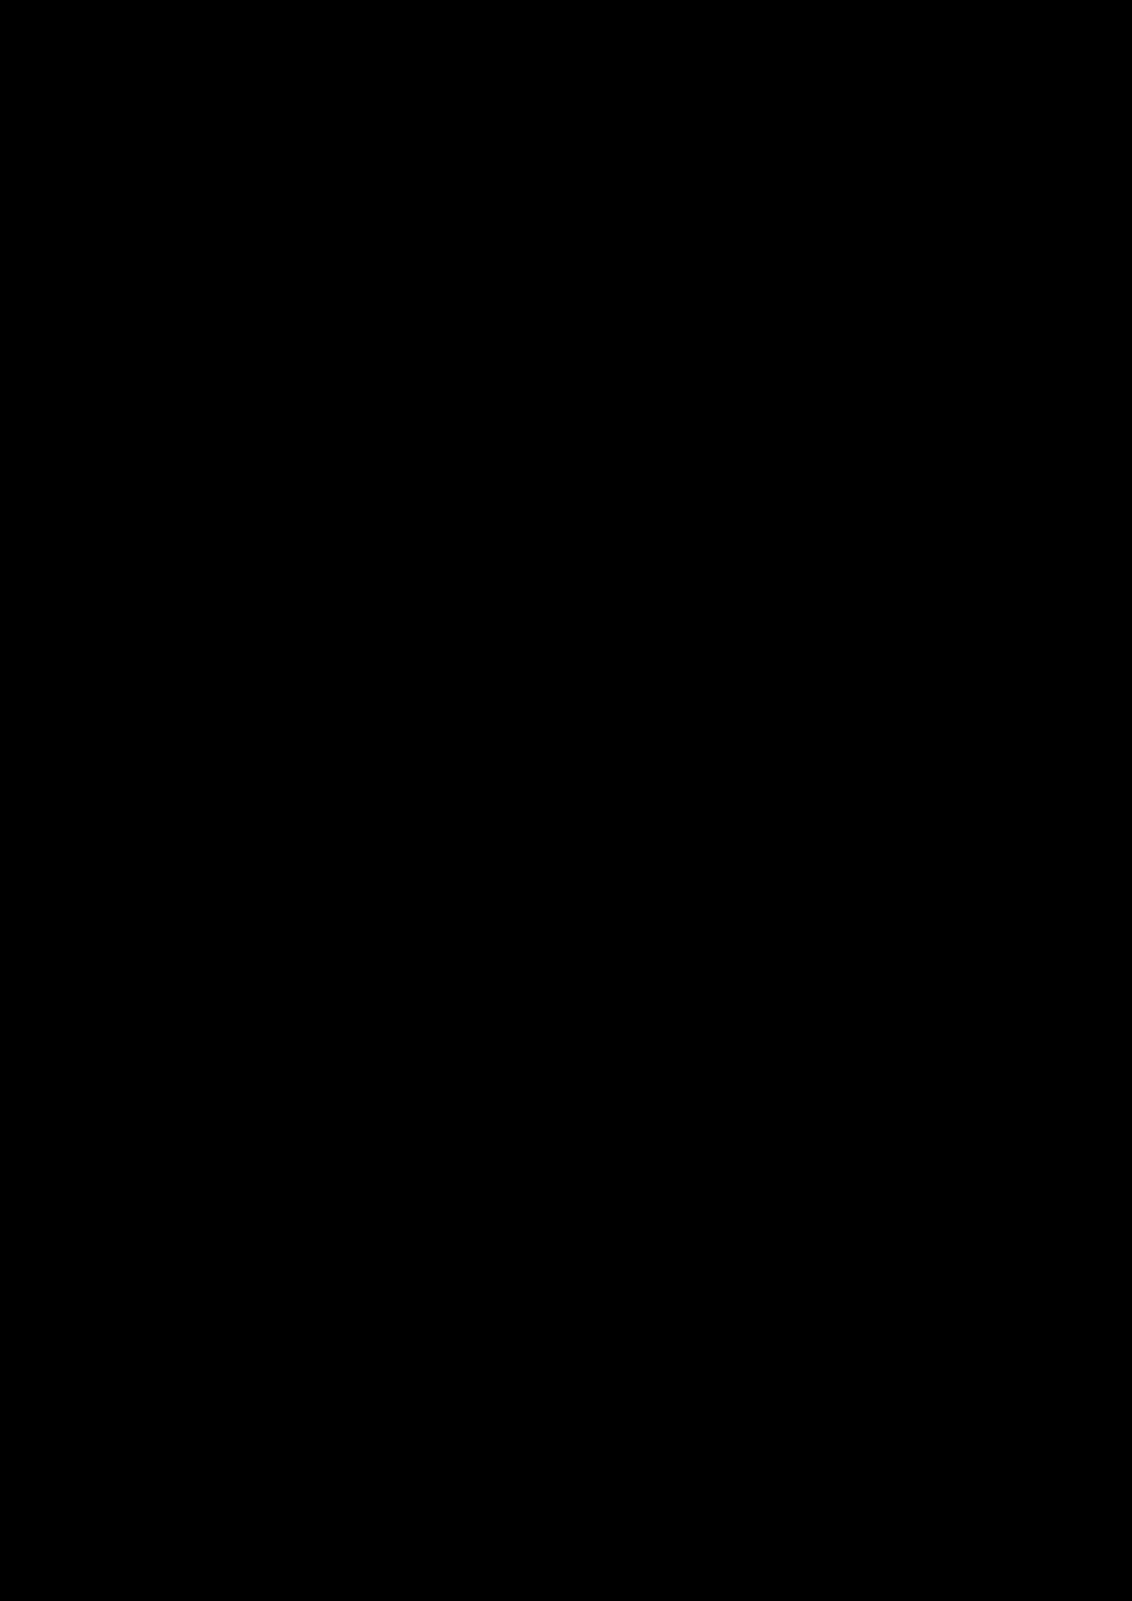 Belyiy sokol slide, Image 56